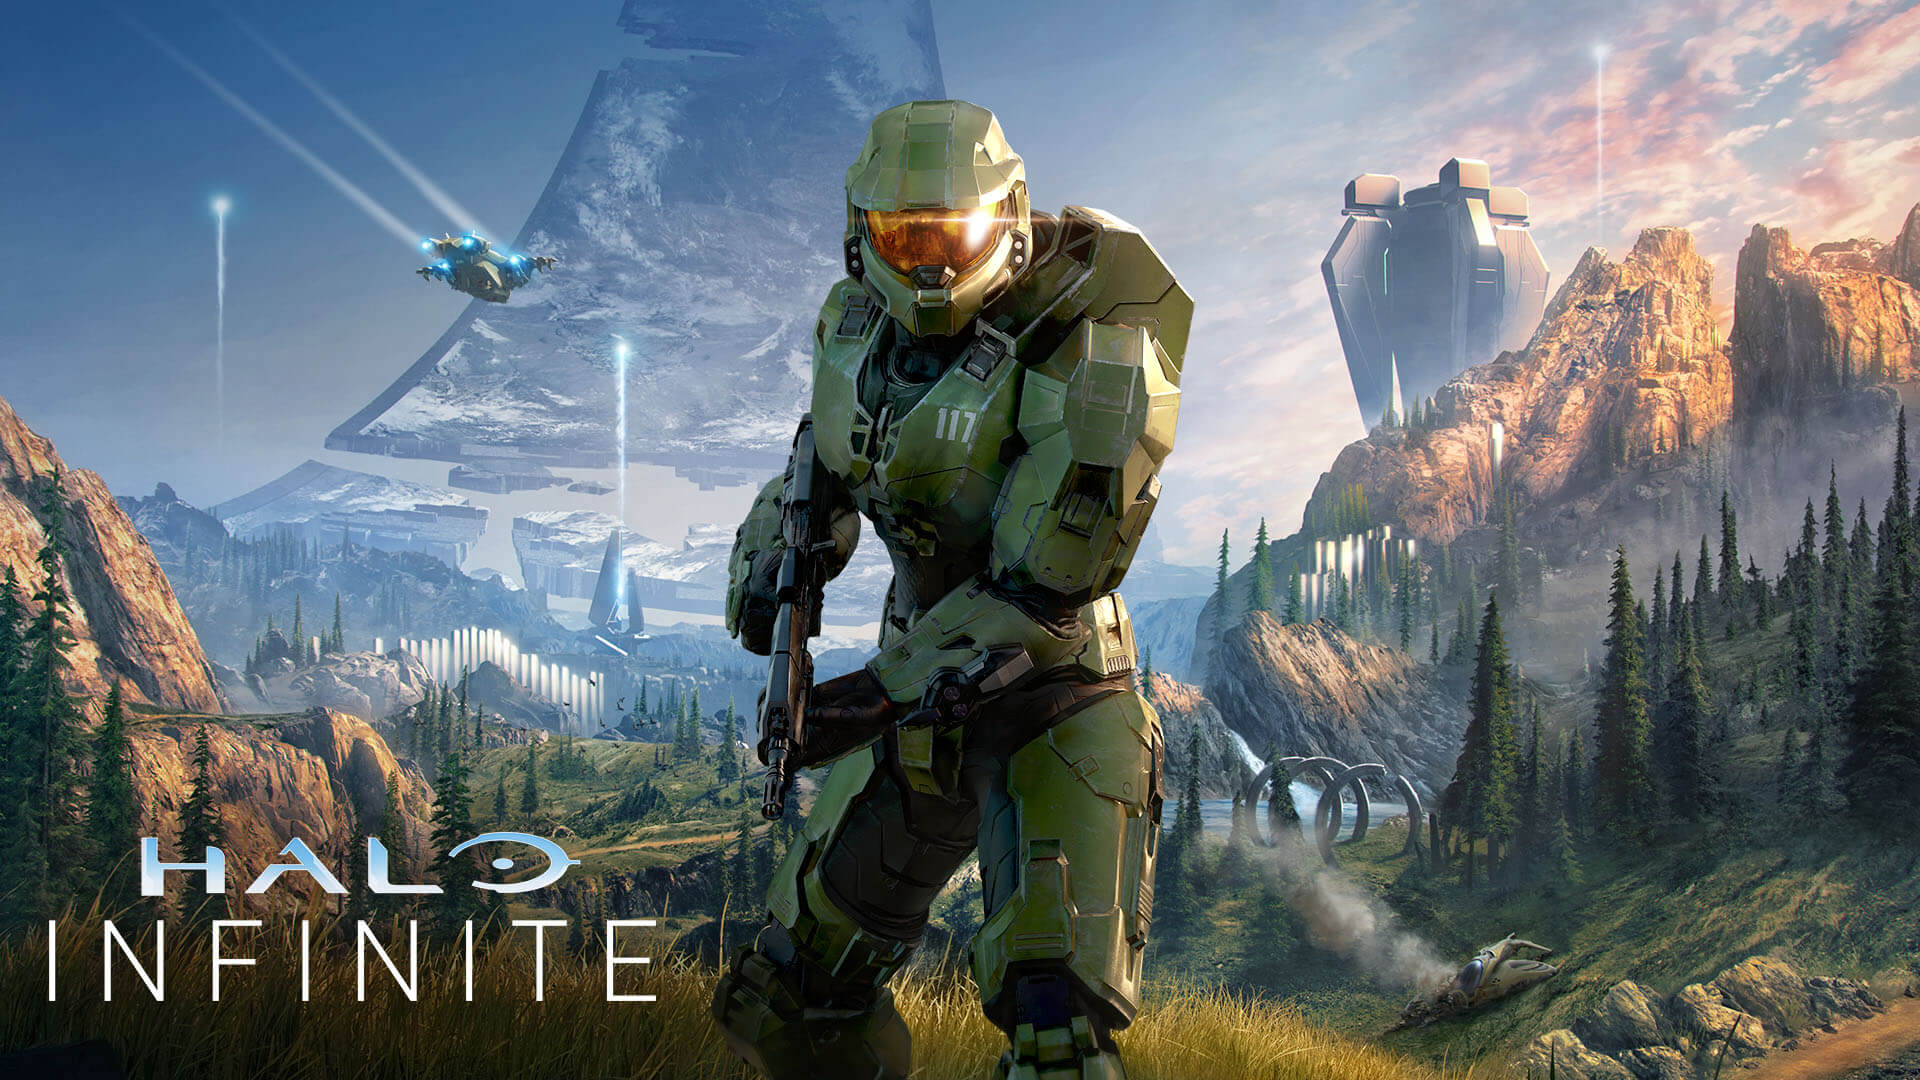 Master Chief Returns in Halo Infinite Demo